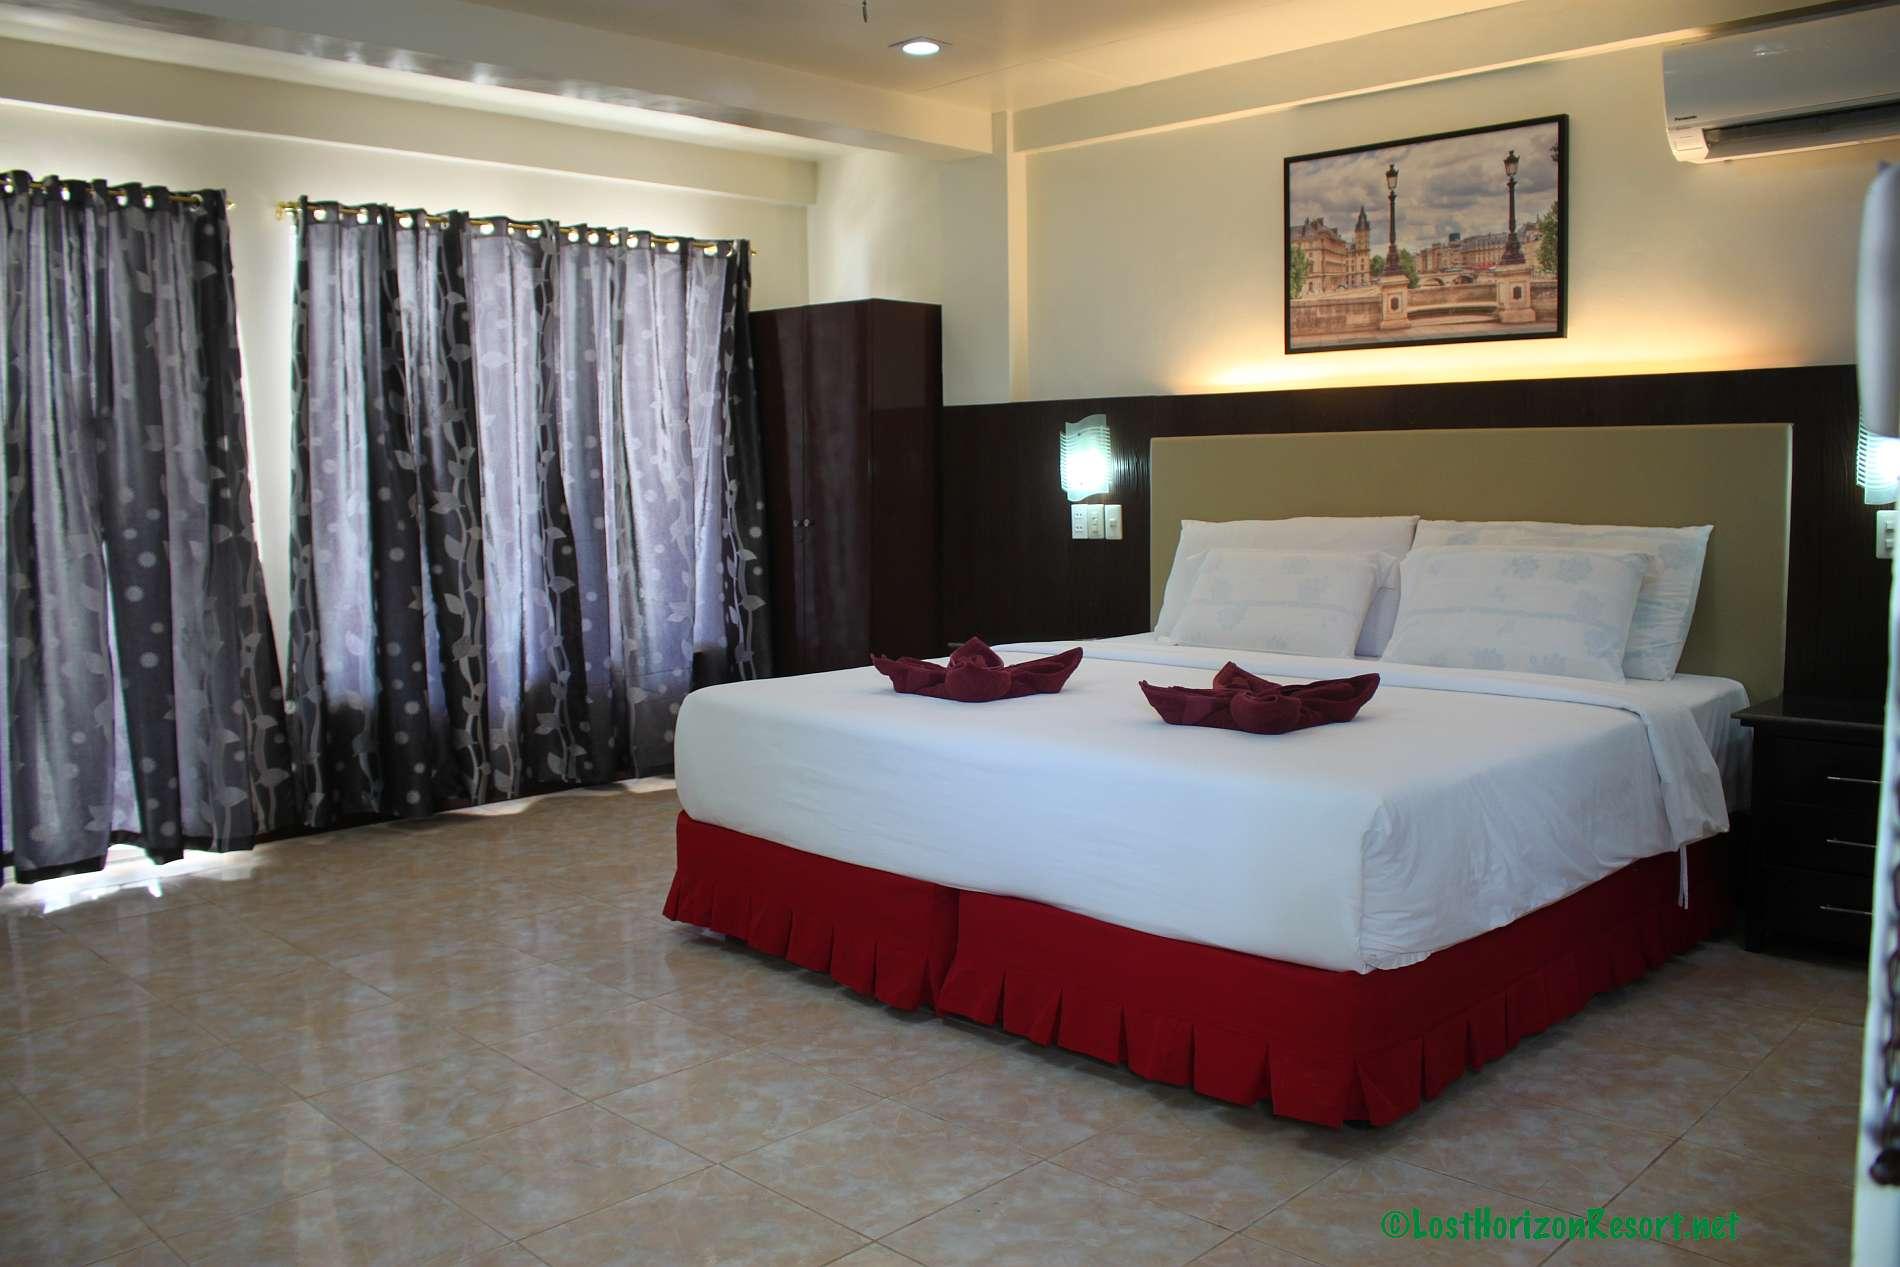 Lost-Horizon-Beach-Resort-Alona-Beach-Panglao-Bohol-Philippines-sun-view-room064